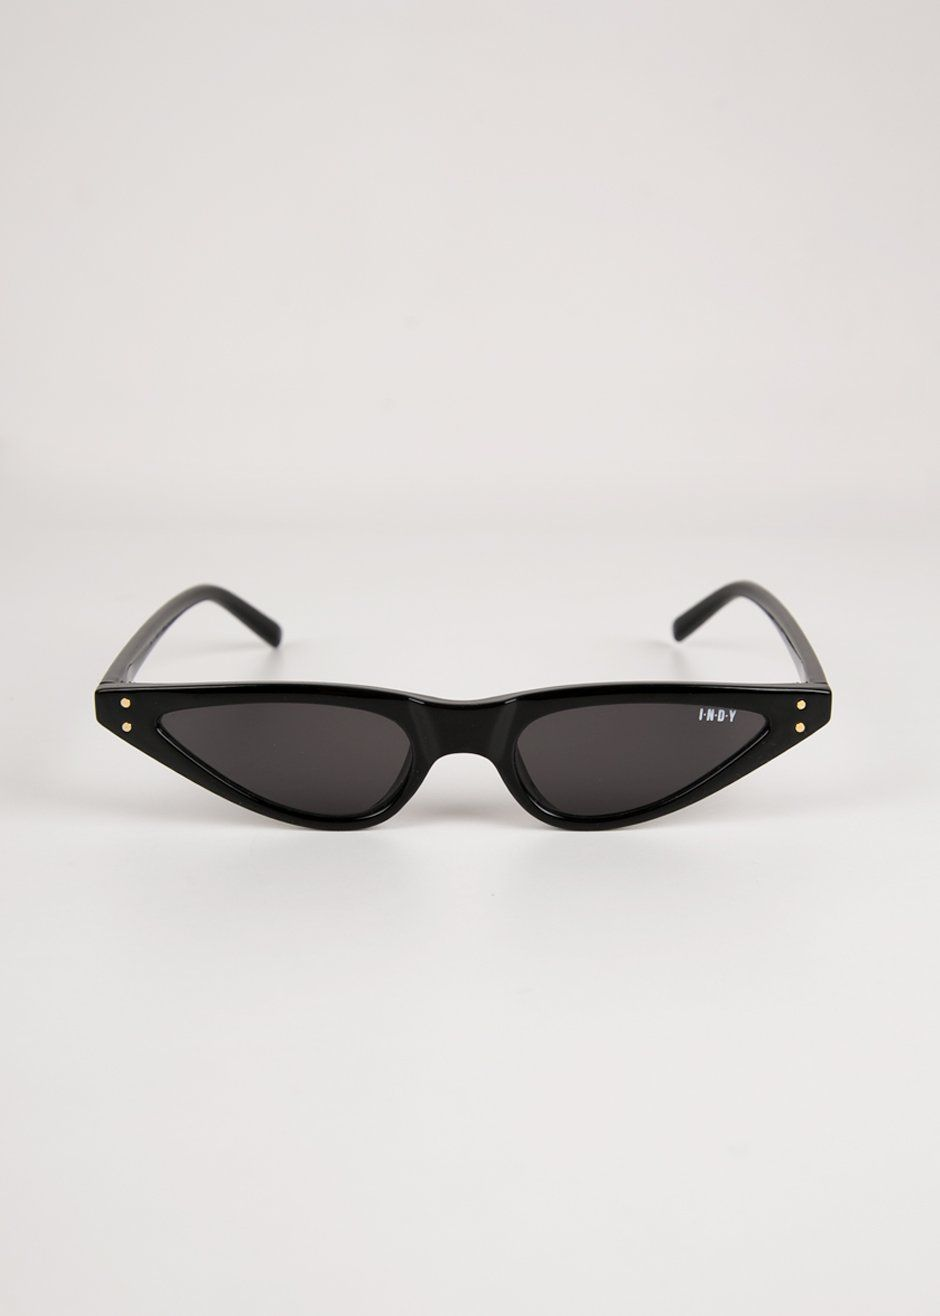 3836a595614  newarrivals  indy  mia  black  sunglasses  cateye  accessories   thefrankieshop  frankienyc  frankiegirl 90 s Matrix Ultra-Skinny Cat-Eye  Sunglasses Color- ...